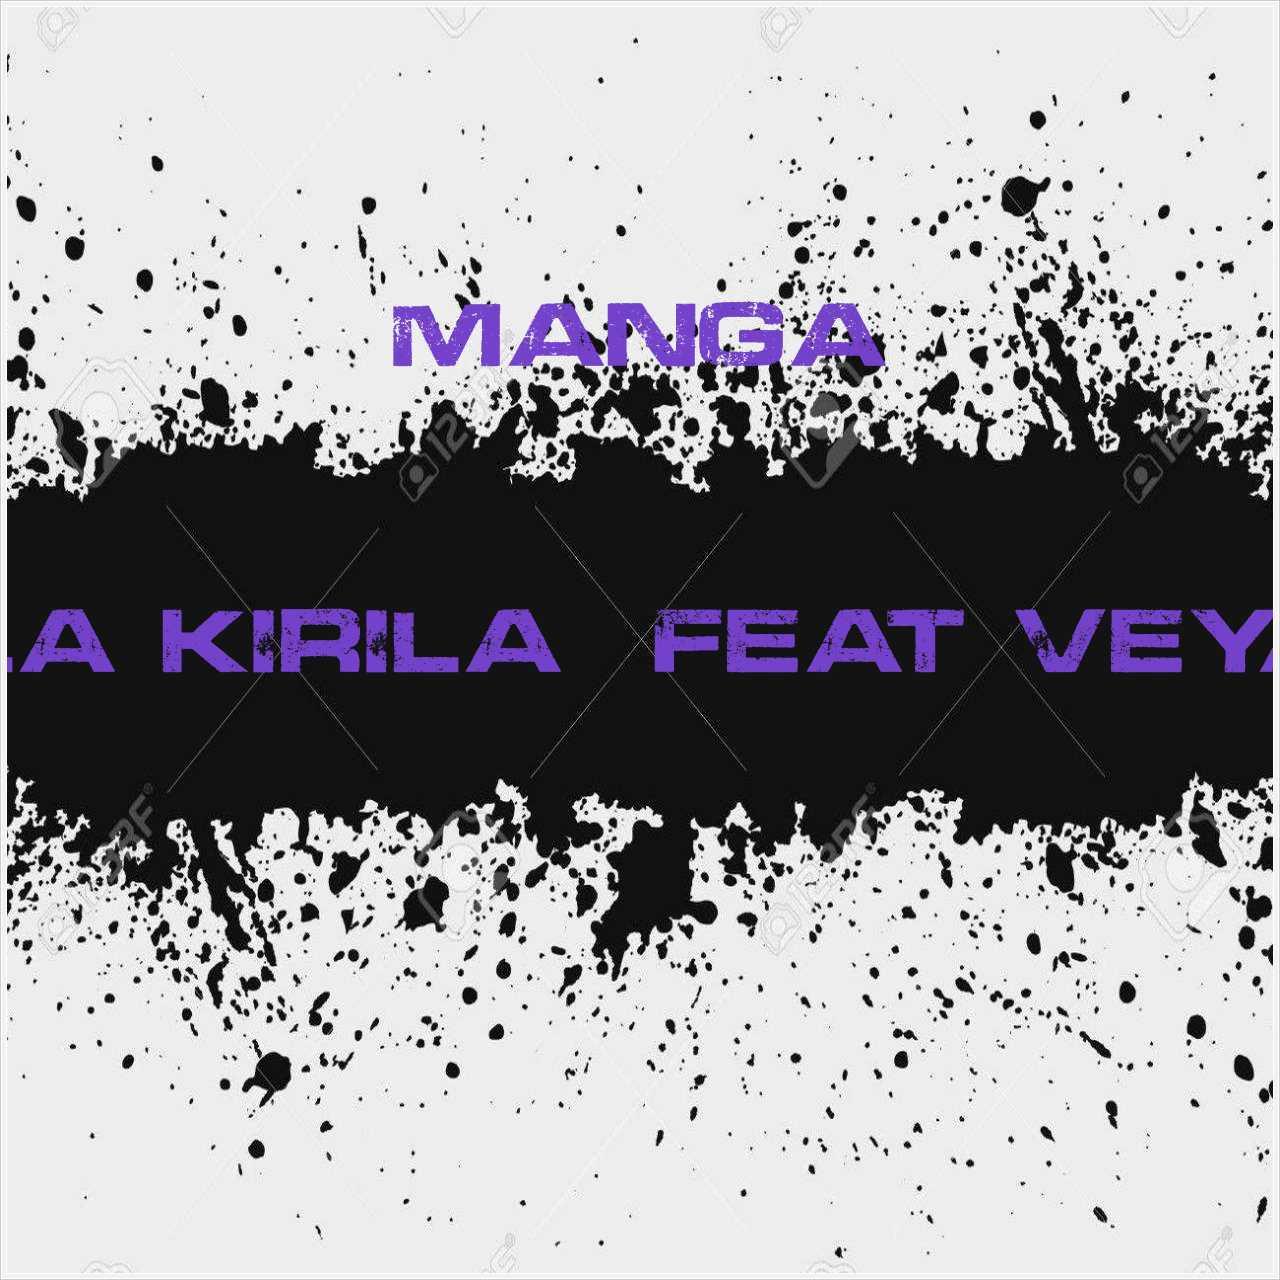 دانلود آهنگ جدید Manga به نام Kırıla Kırıla (feat VEYasin)